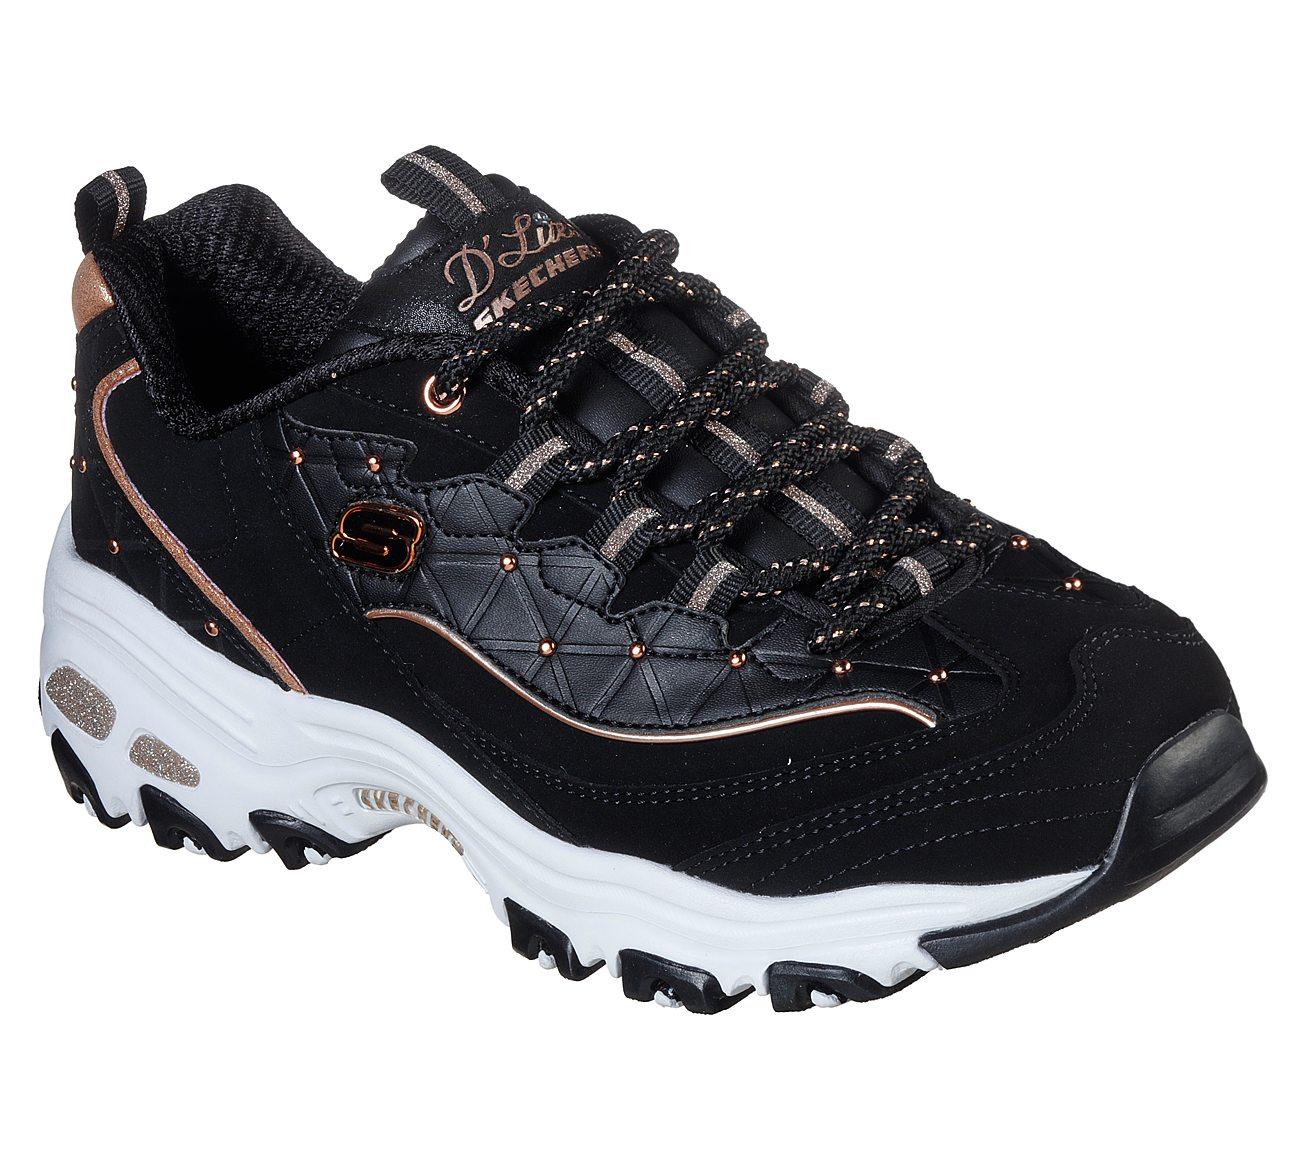 Diamond Joy Skechers D'Lites Shoes